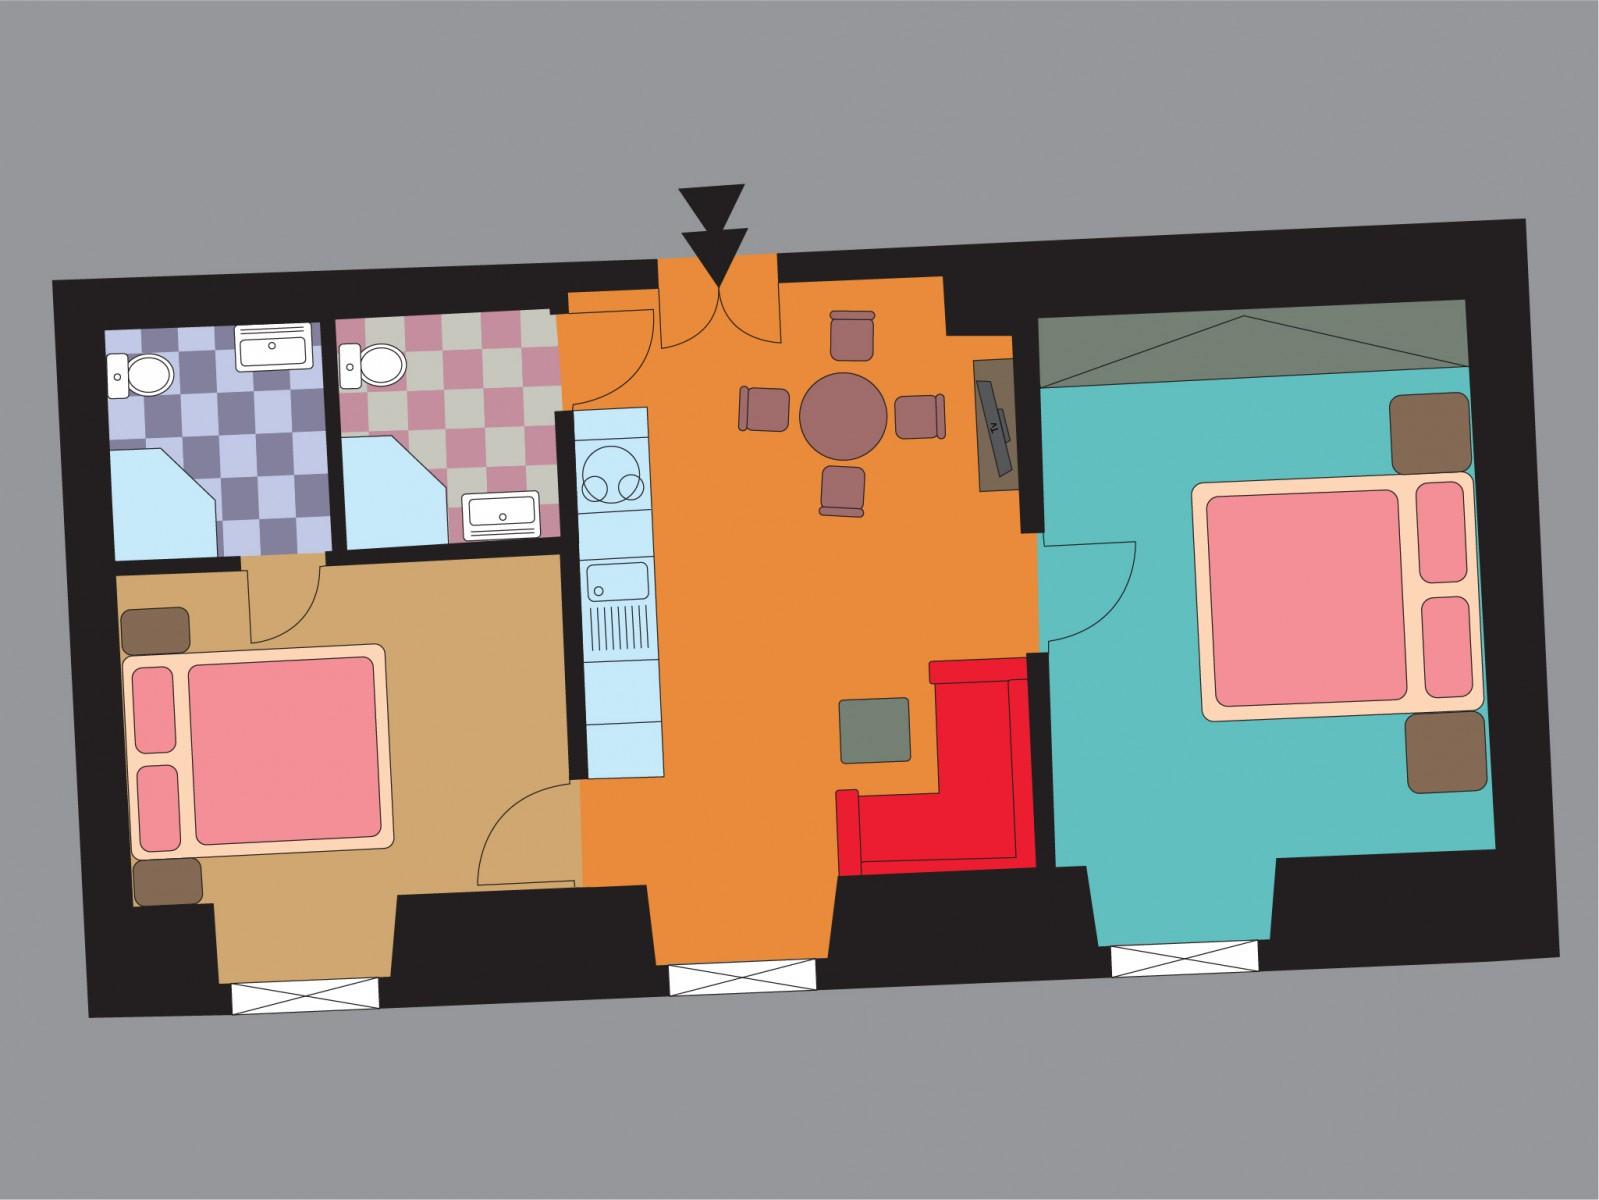 План апартамента Gladiolus